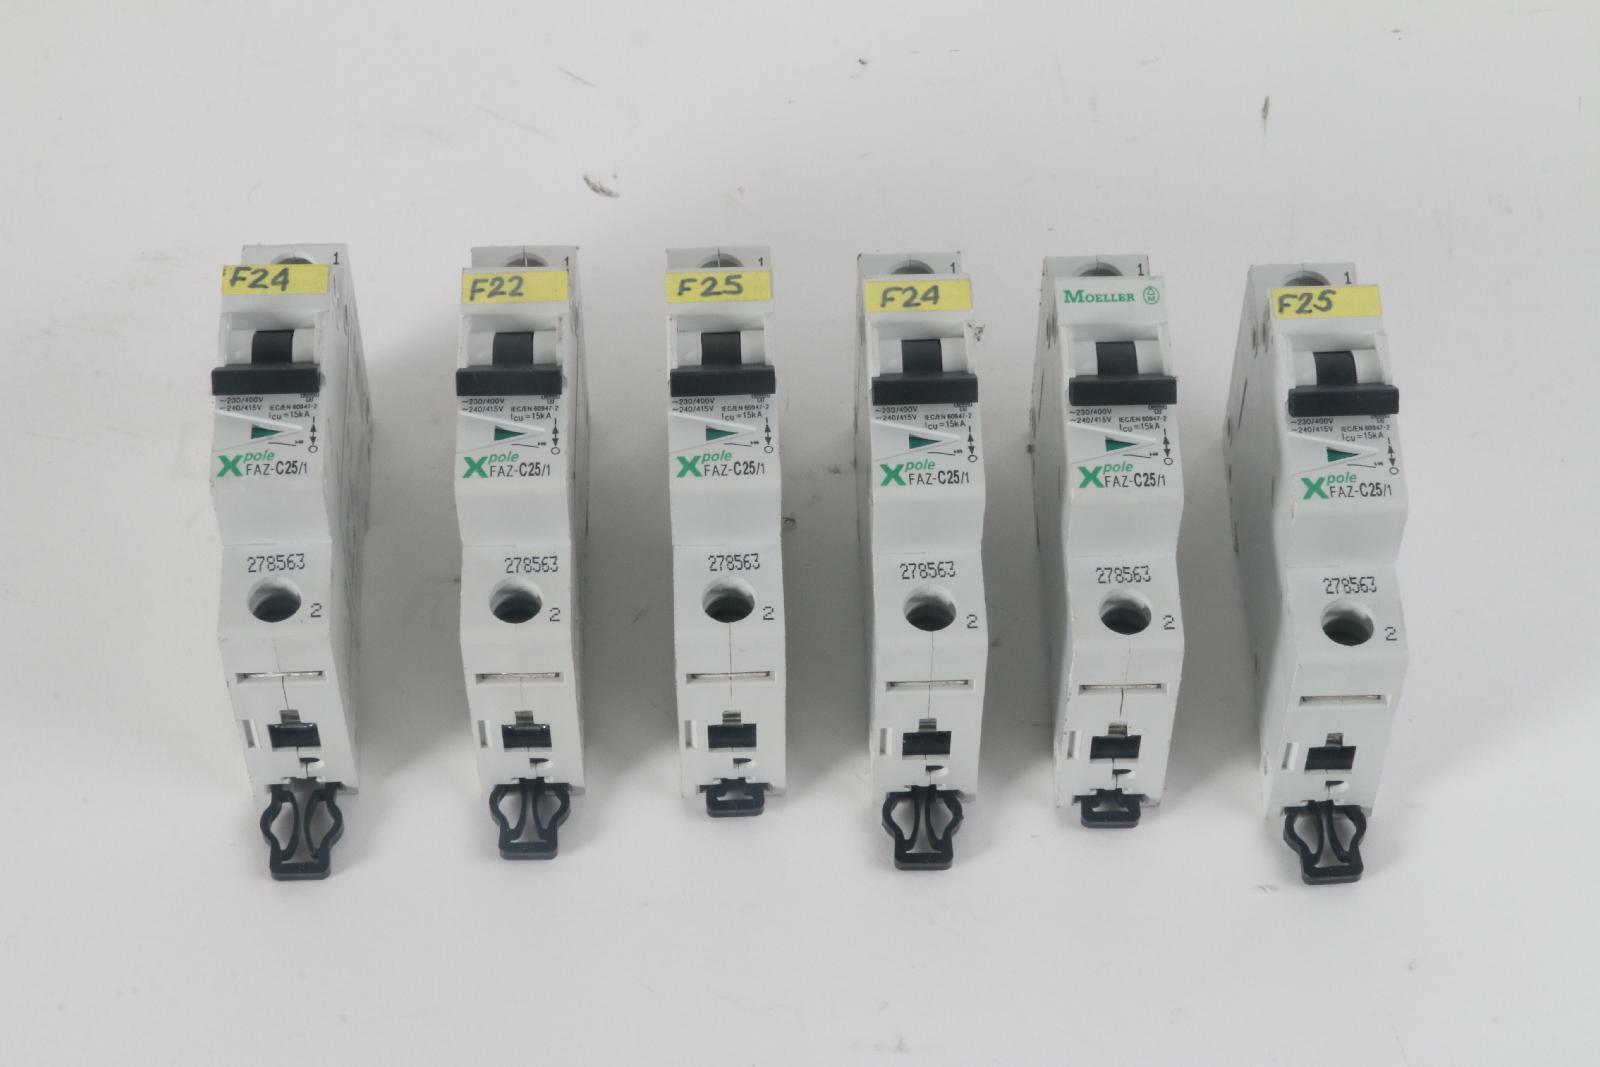 Lot of 6 Moeller FAZ-C25 1 Miniature Circuit Breaker 1-Pole 25 Amp